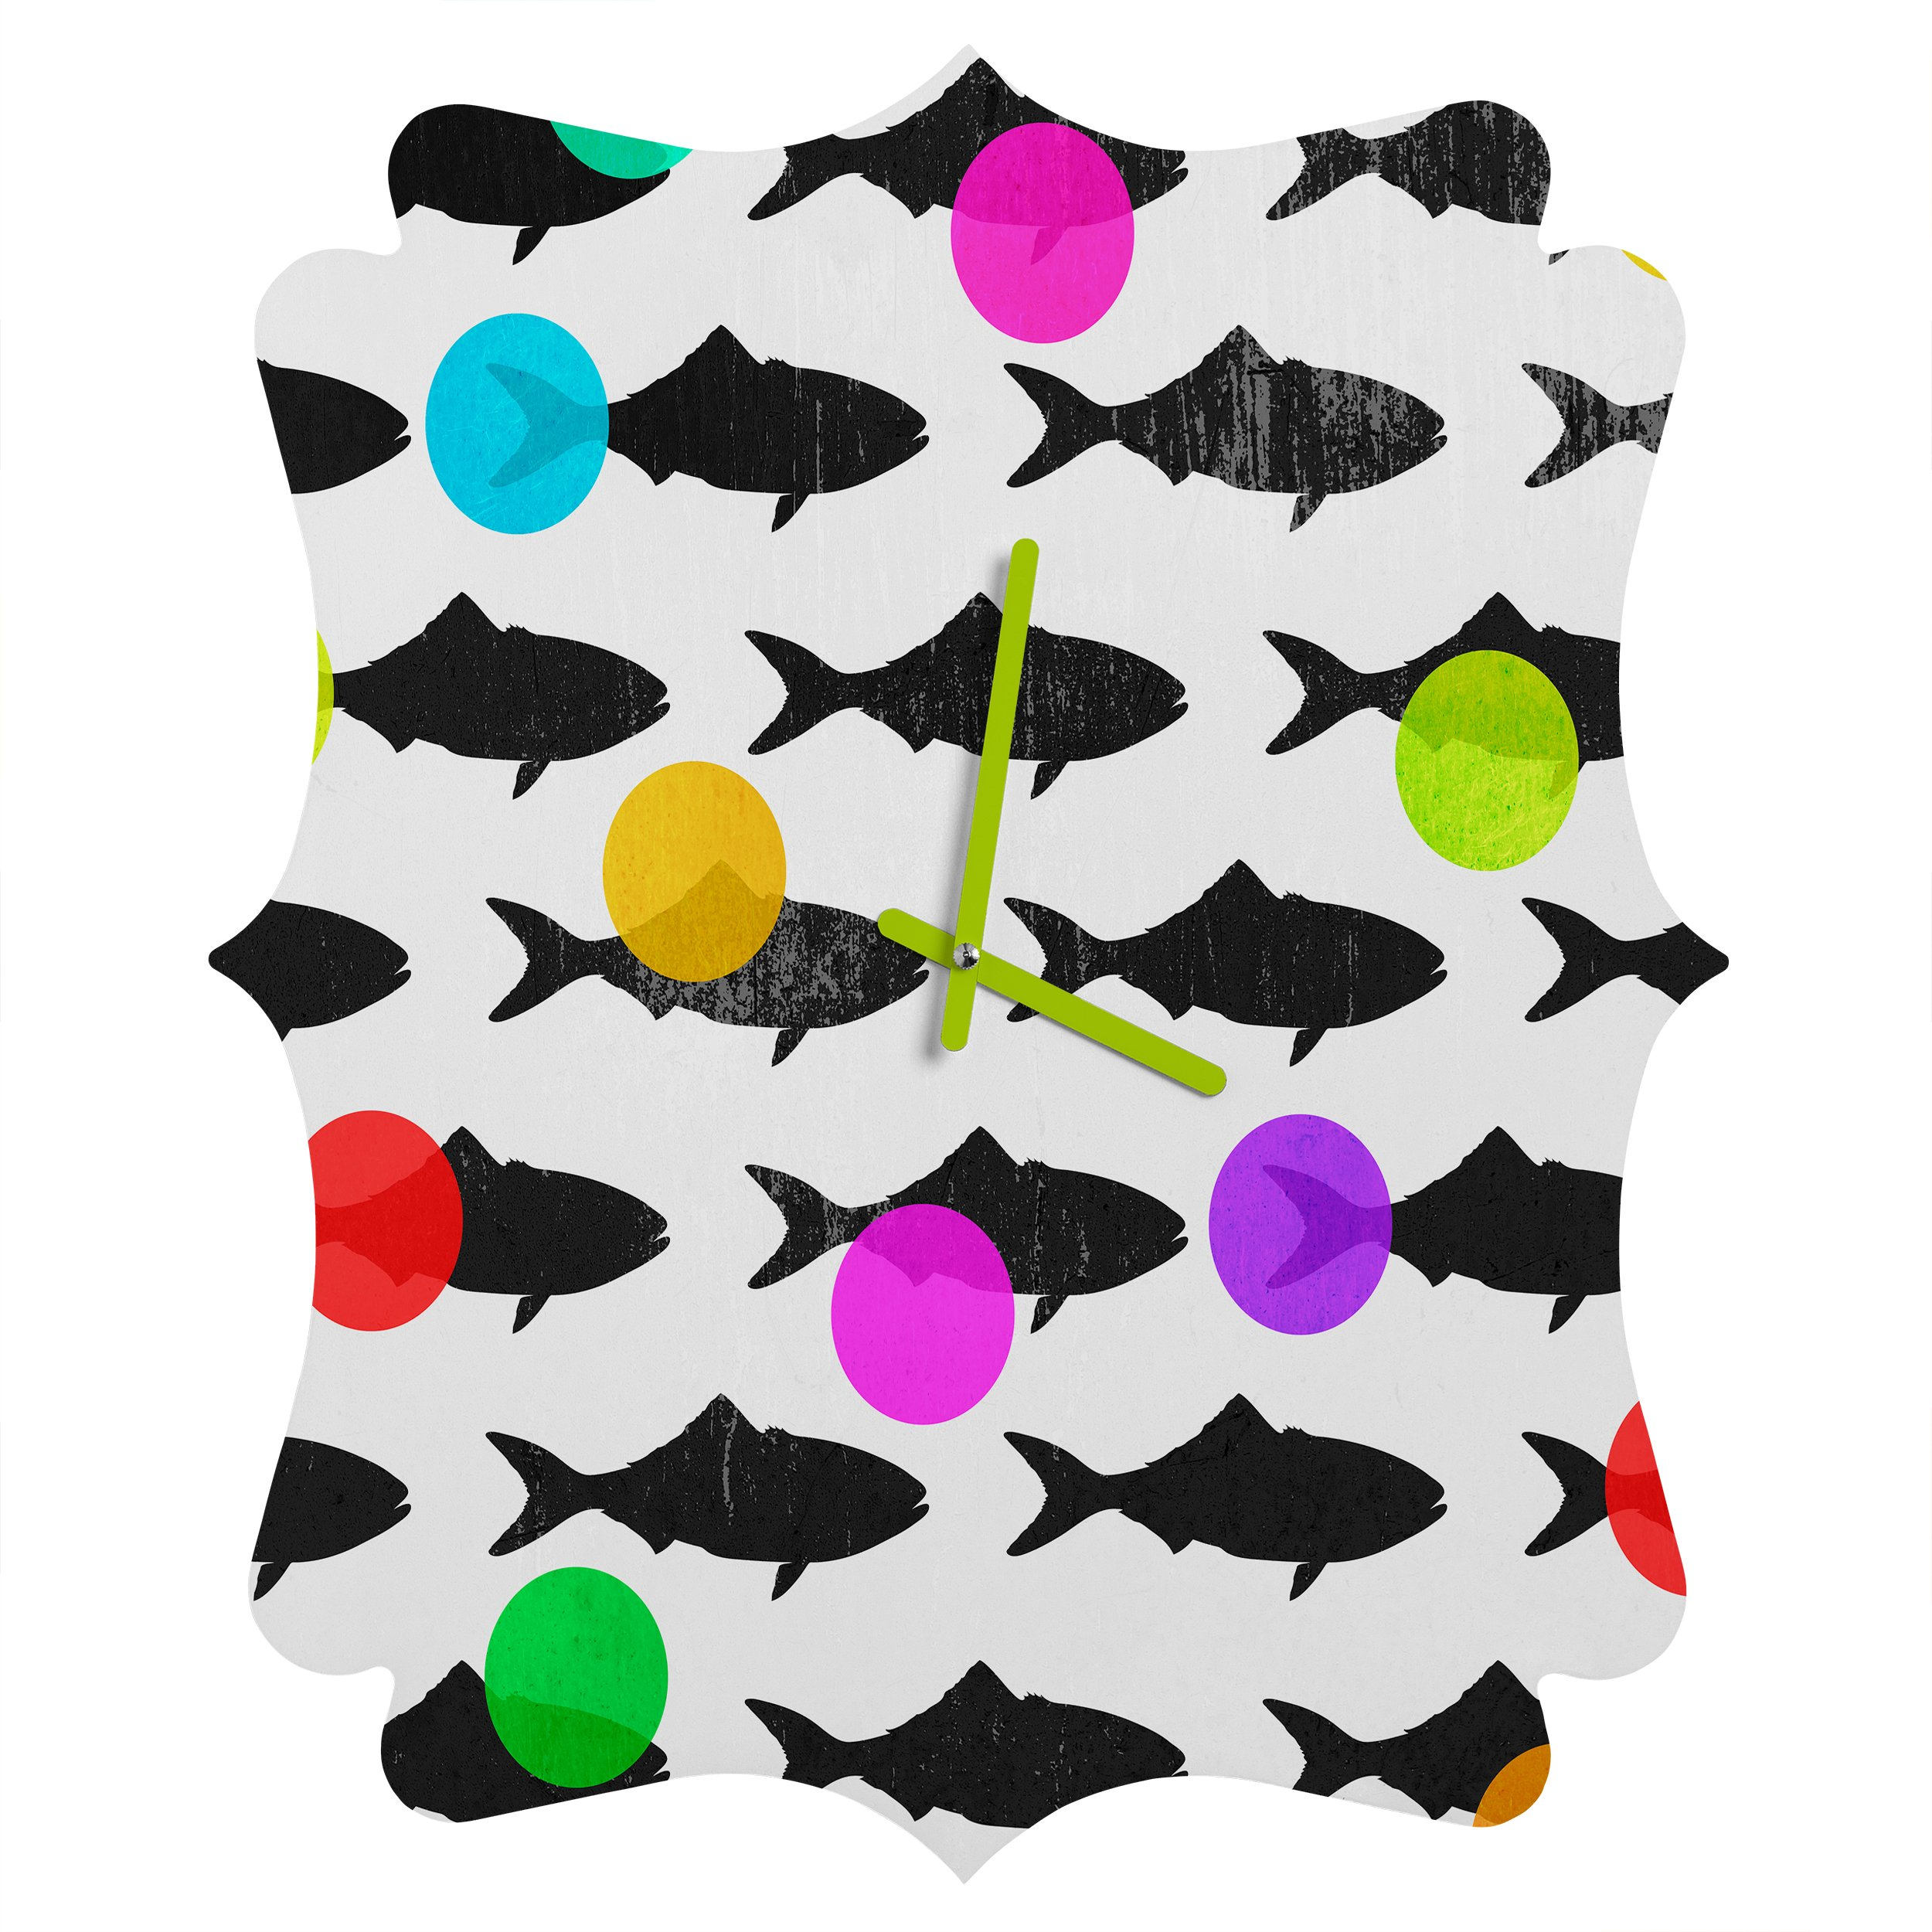 Deny Designs Elisabeth Fredriksson, Happy Fish, Quatrefoil Clock, Medium